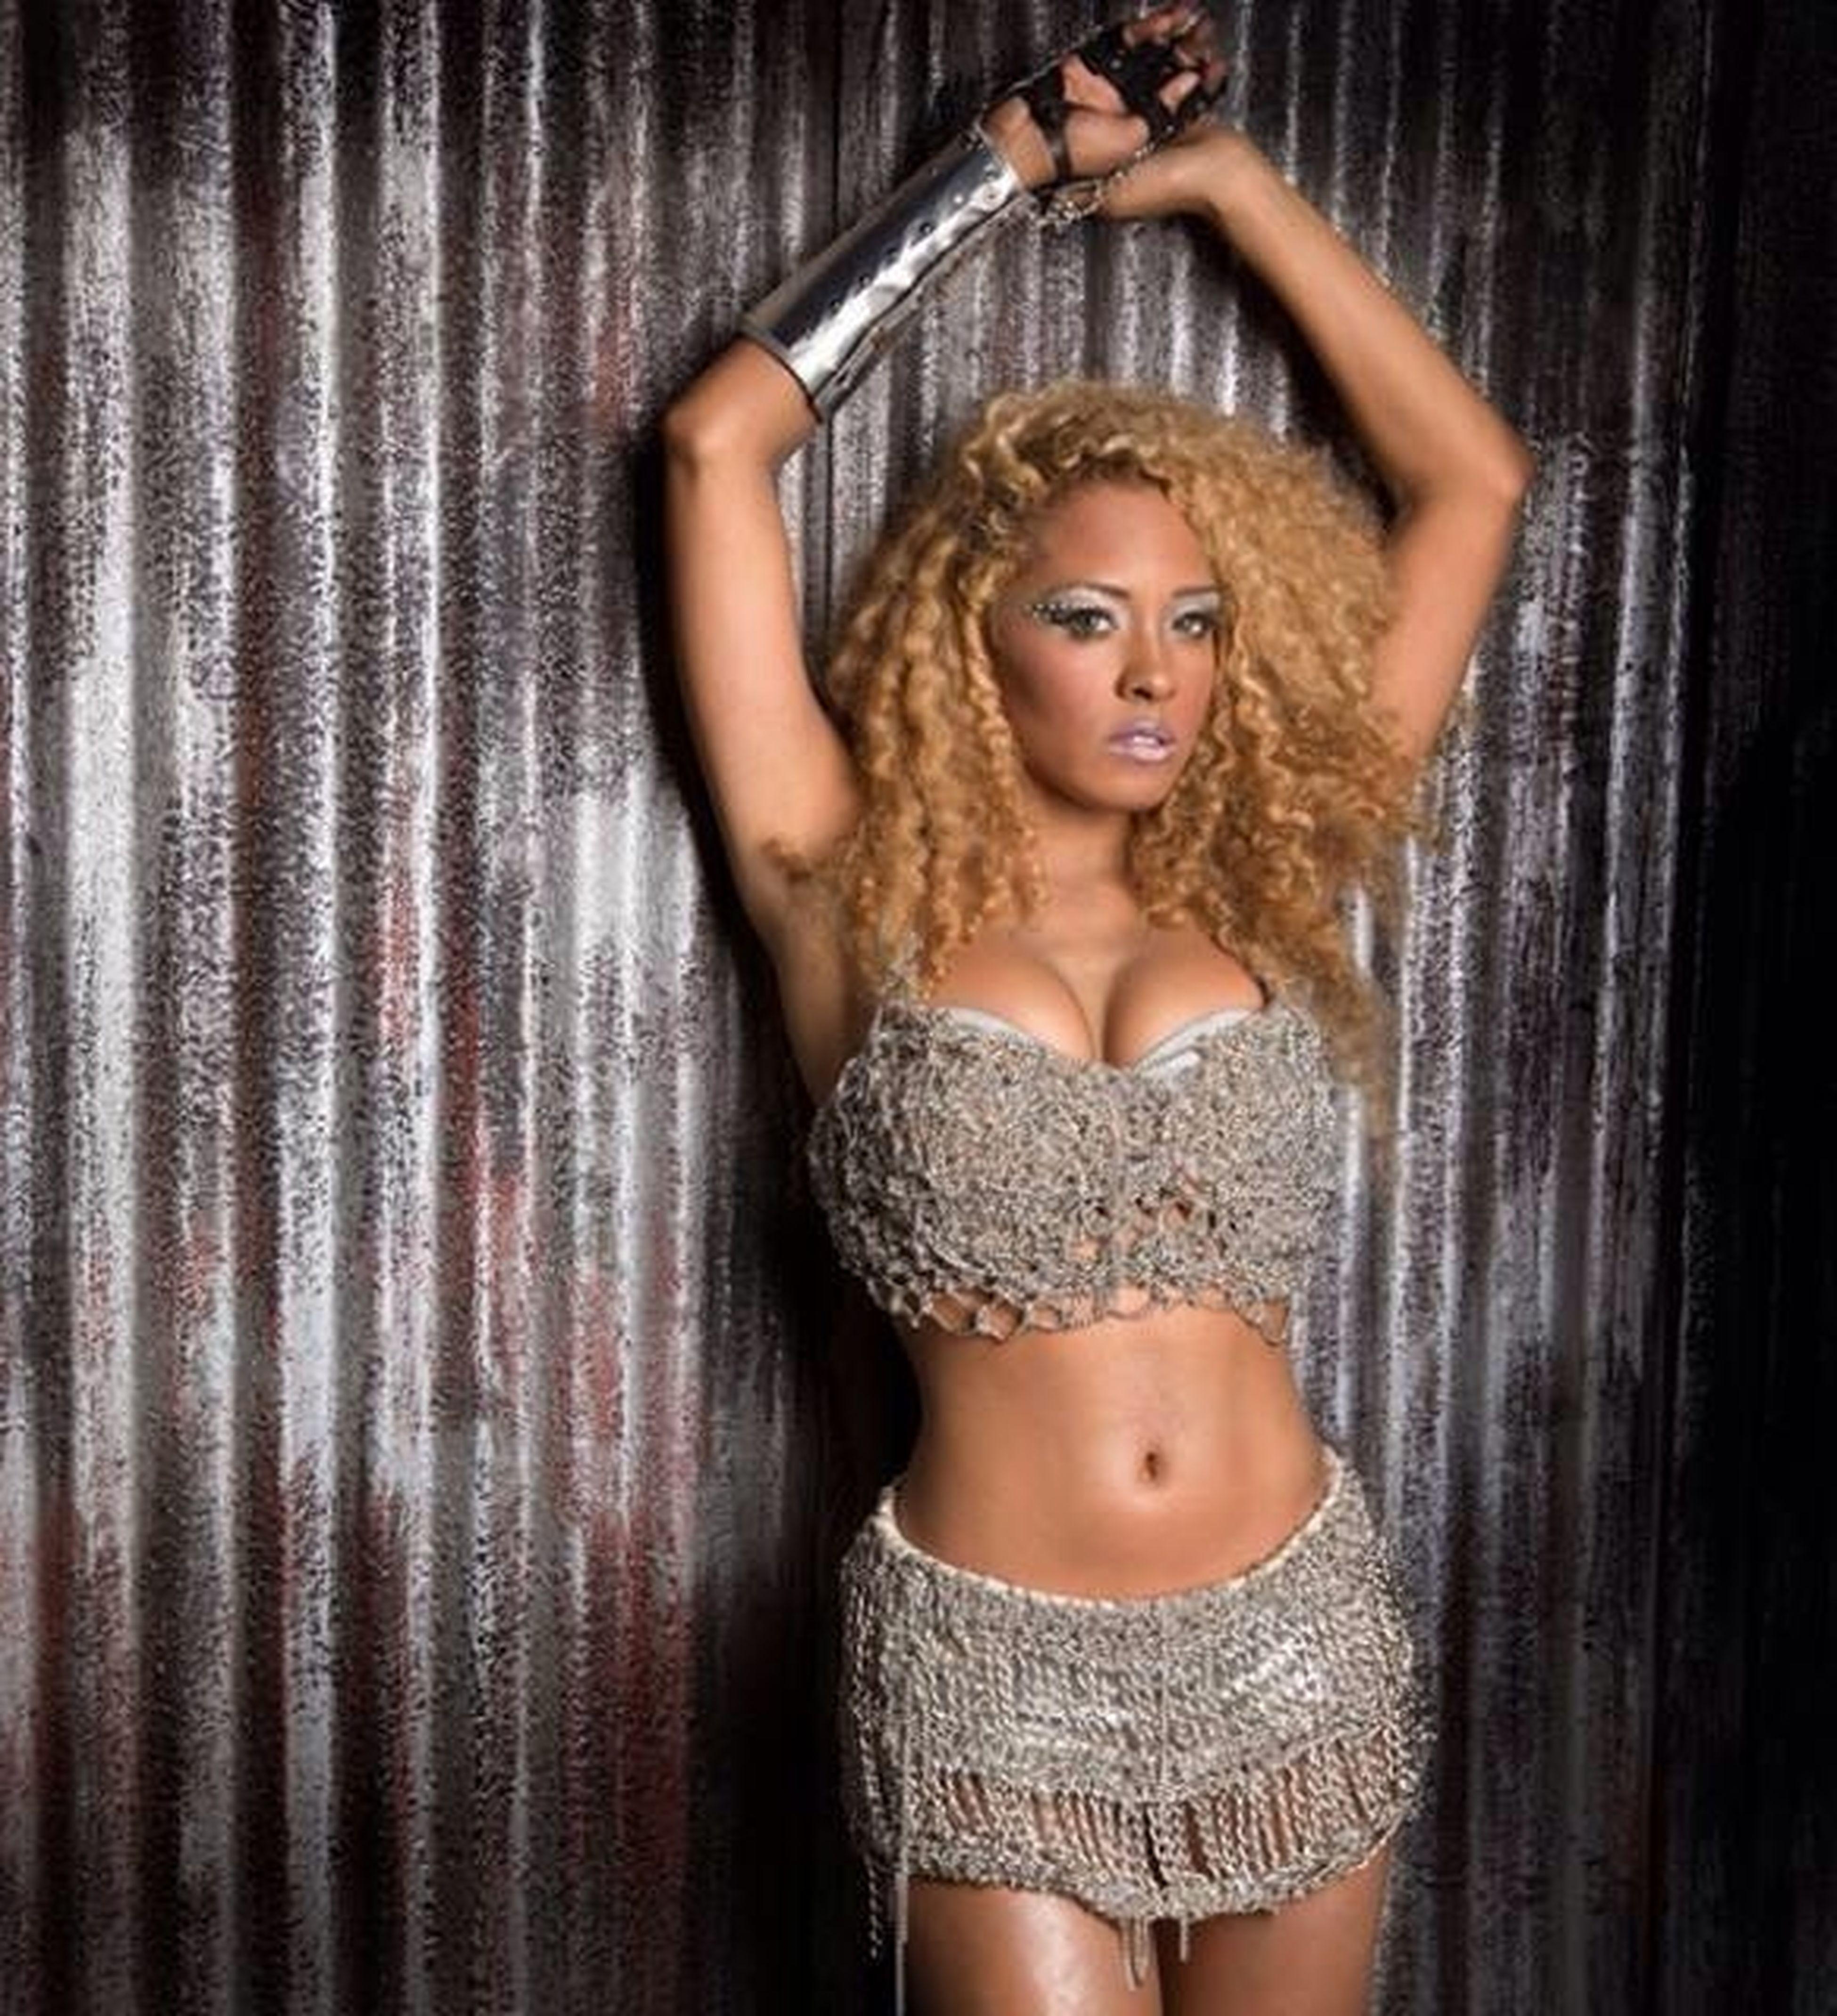 Www.youtube.com/zhaveavevo Dancehall Reggae  Singer  Dancer musicvideo First Eyeem Photo